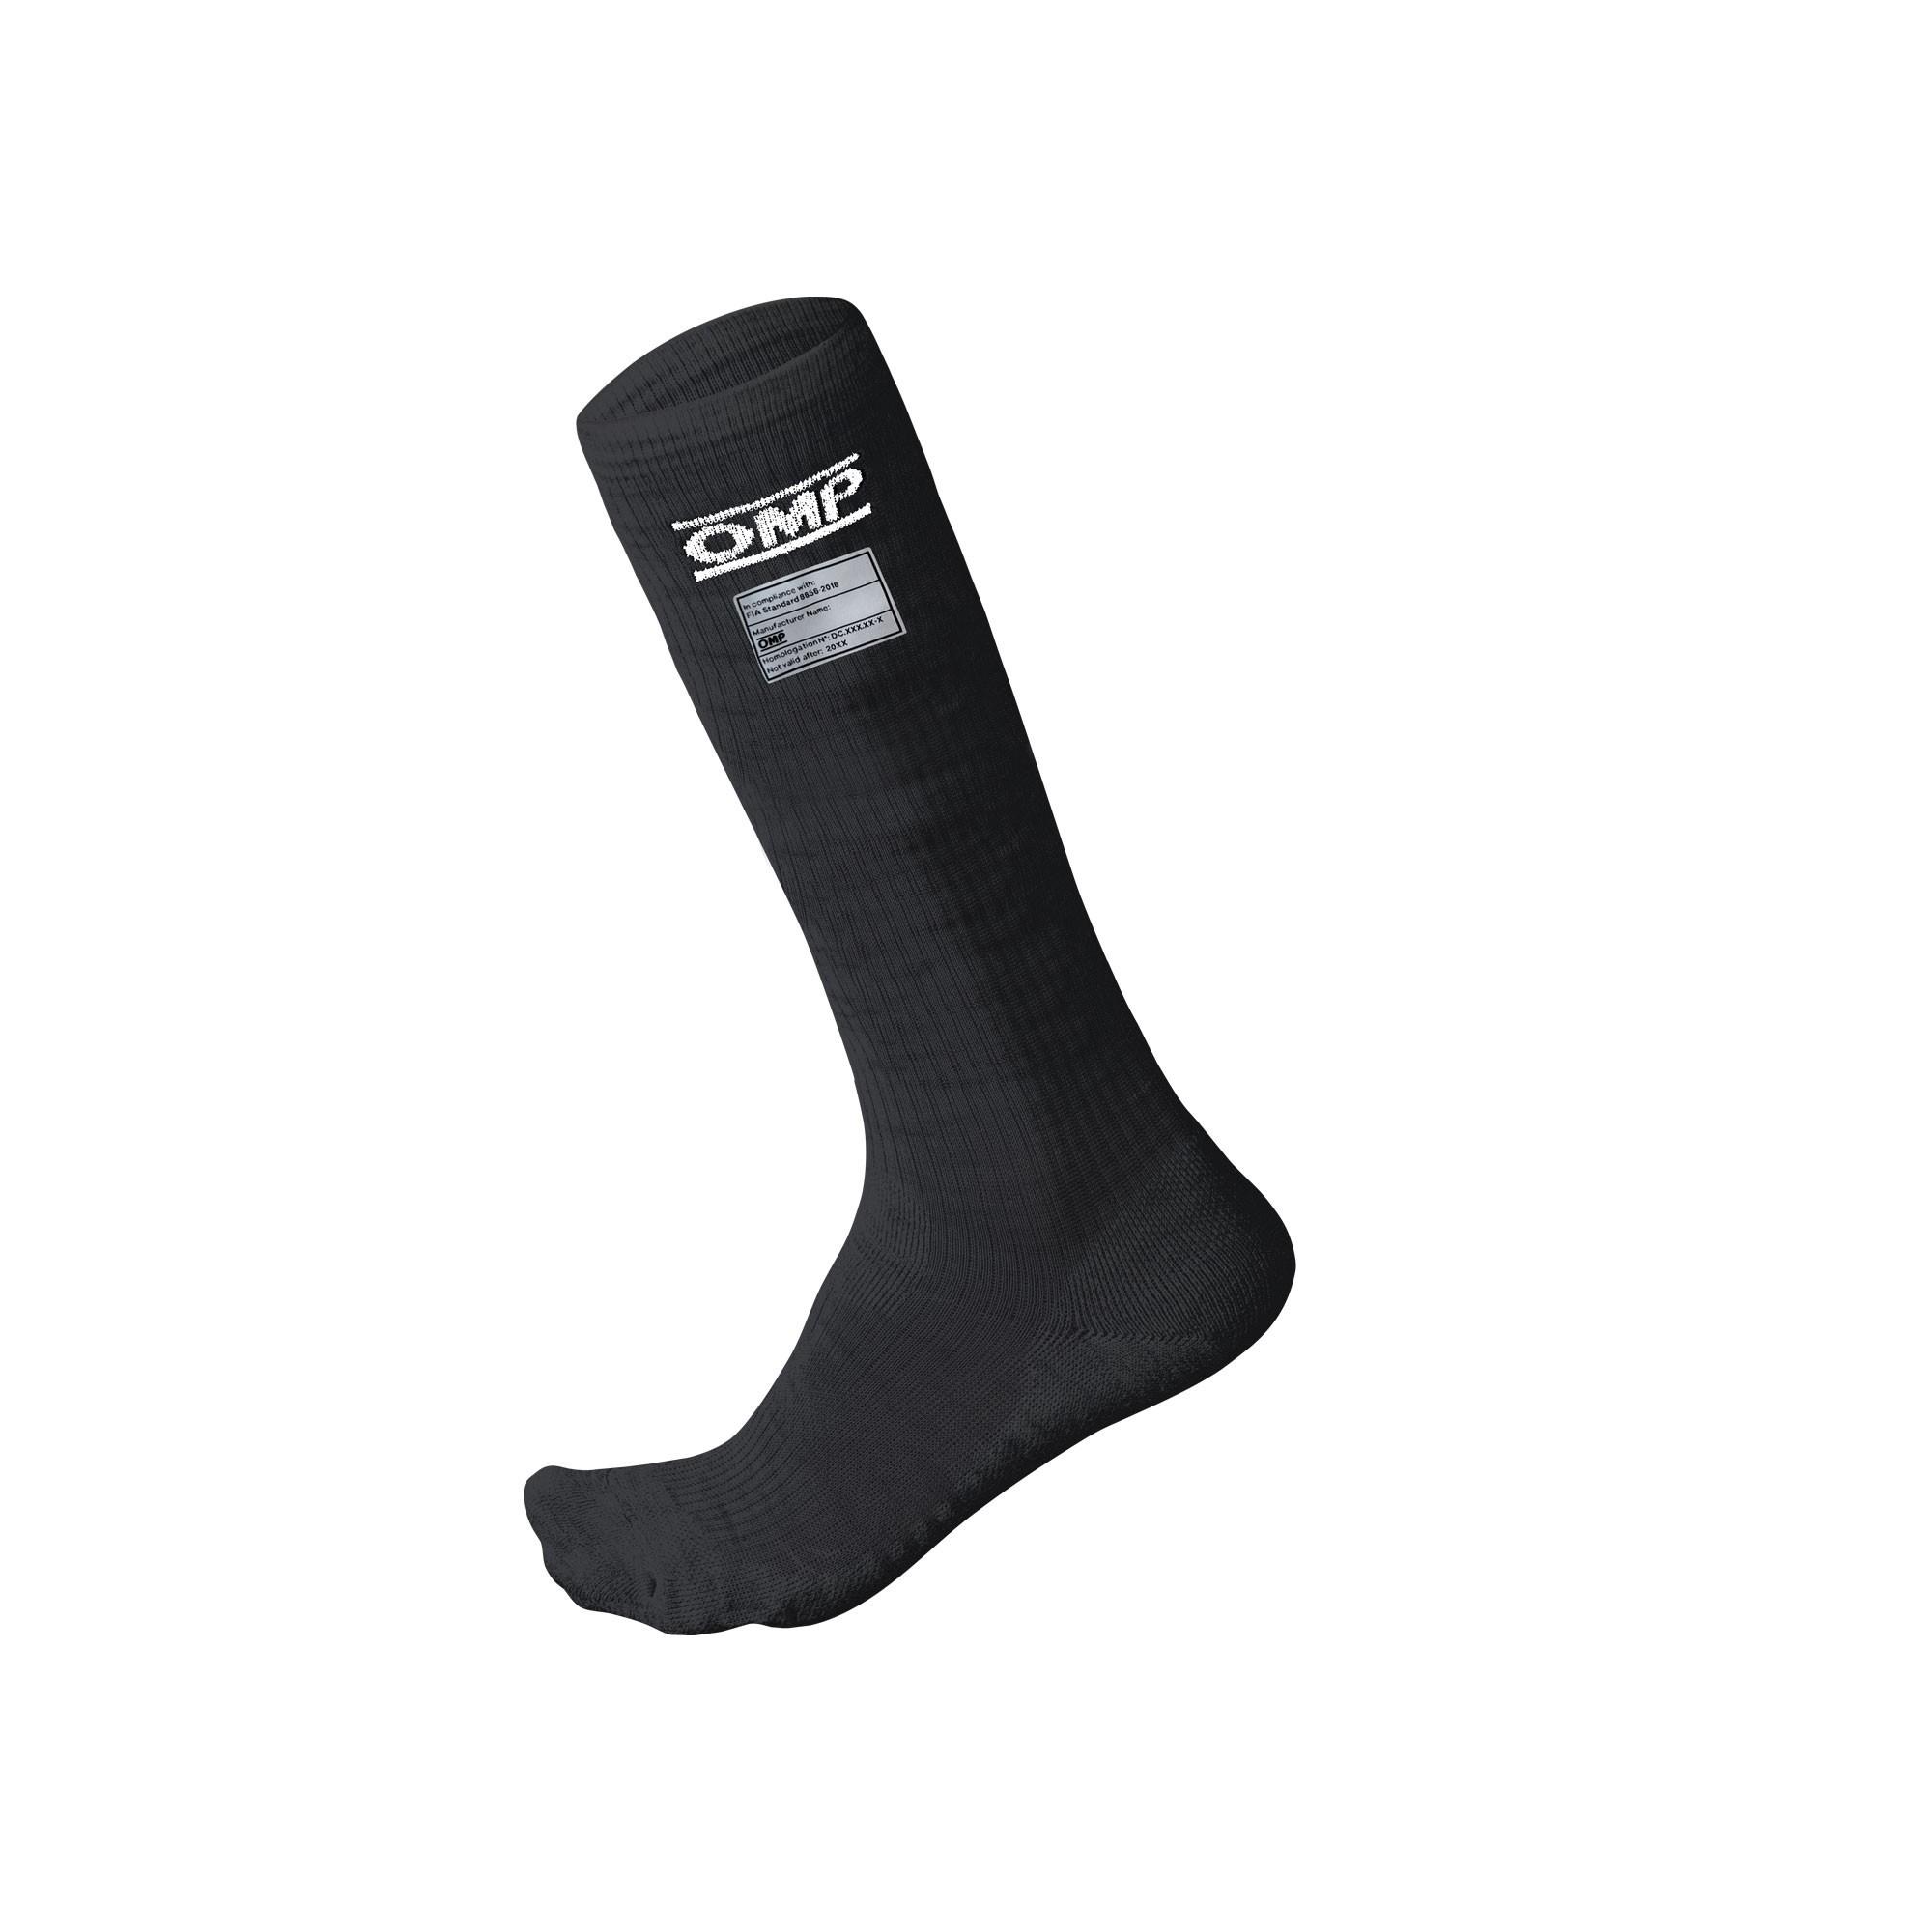 ONE Socks Black my2021